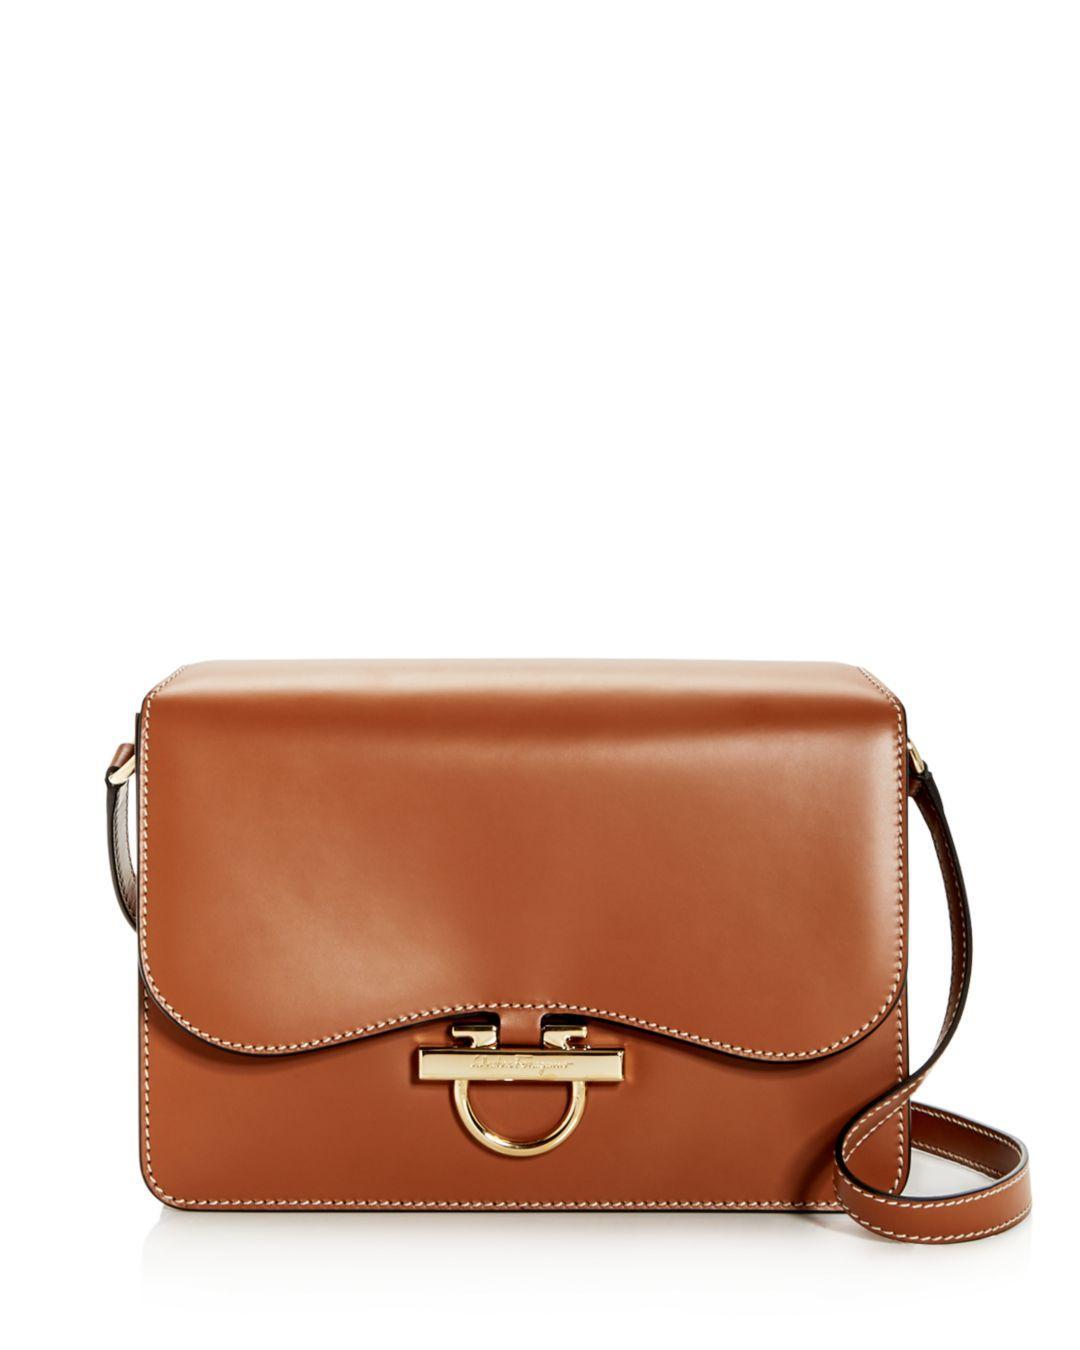 0e1ee48322be Lyst - Ferragamo Joanne Classic Leather Shoulder Bag in Brown